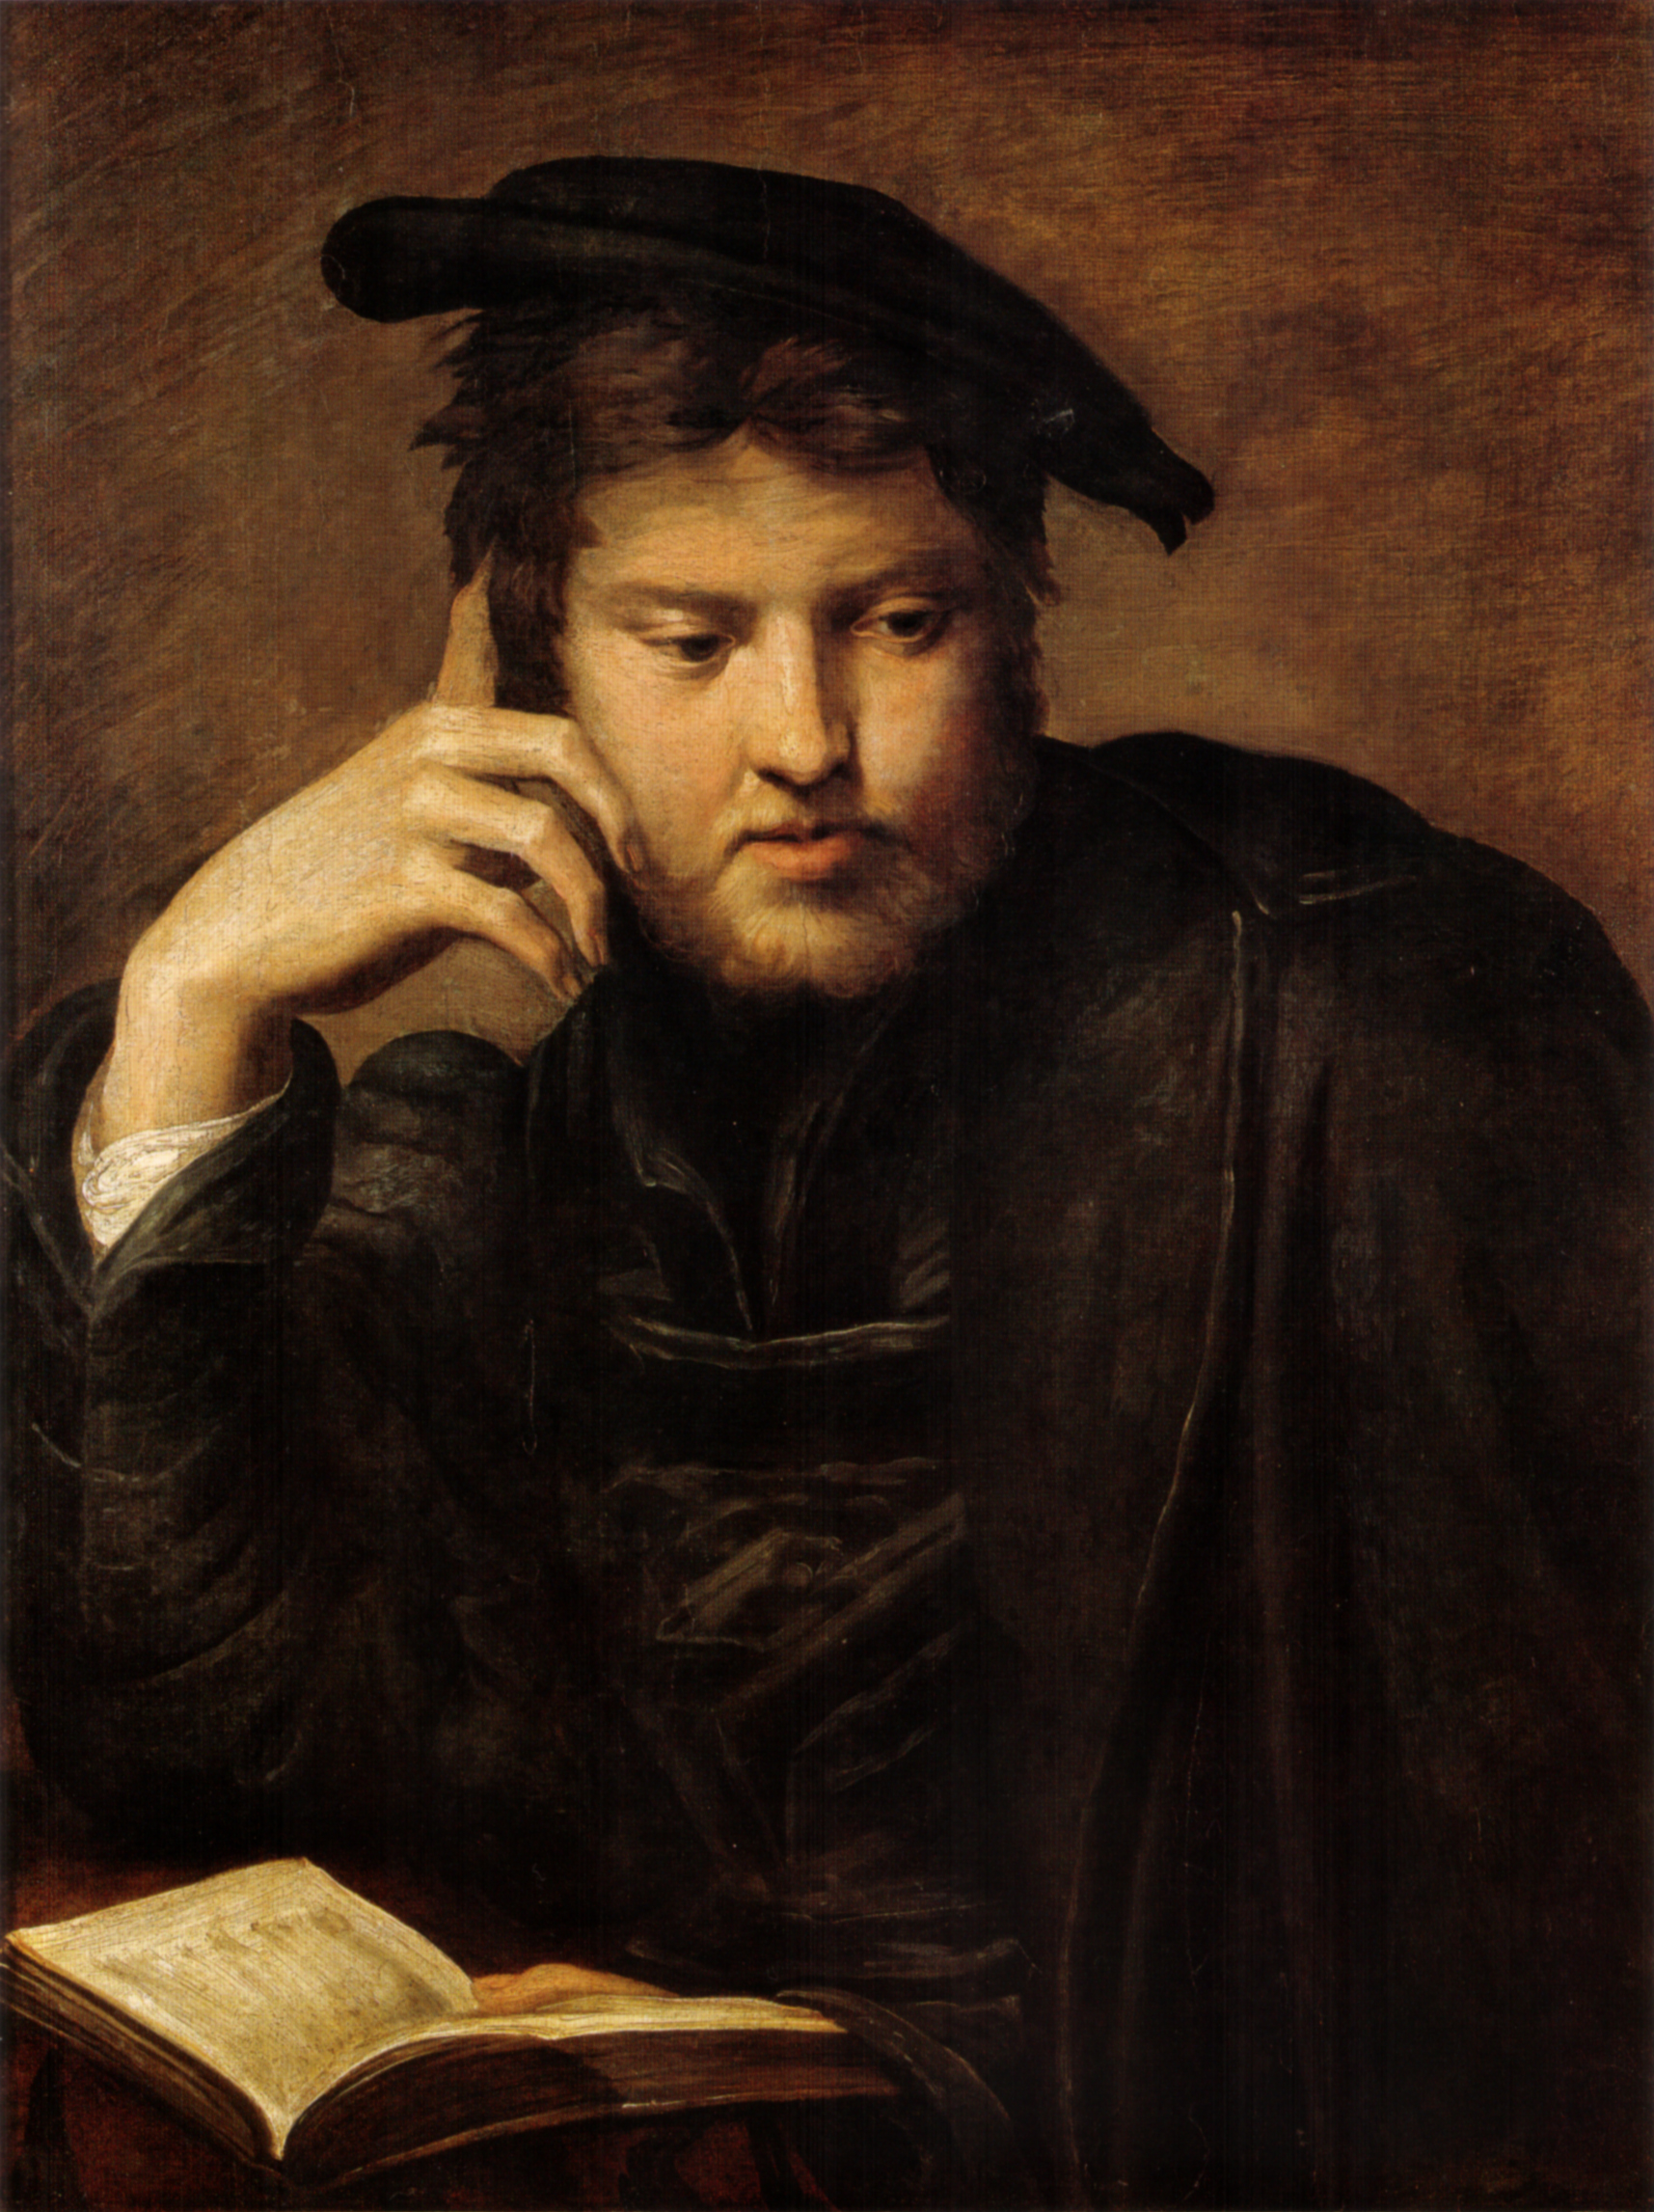 File:Parmigianino, uomo che sospede la lettura, vienna.jpg ...